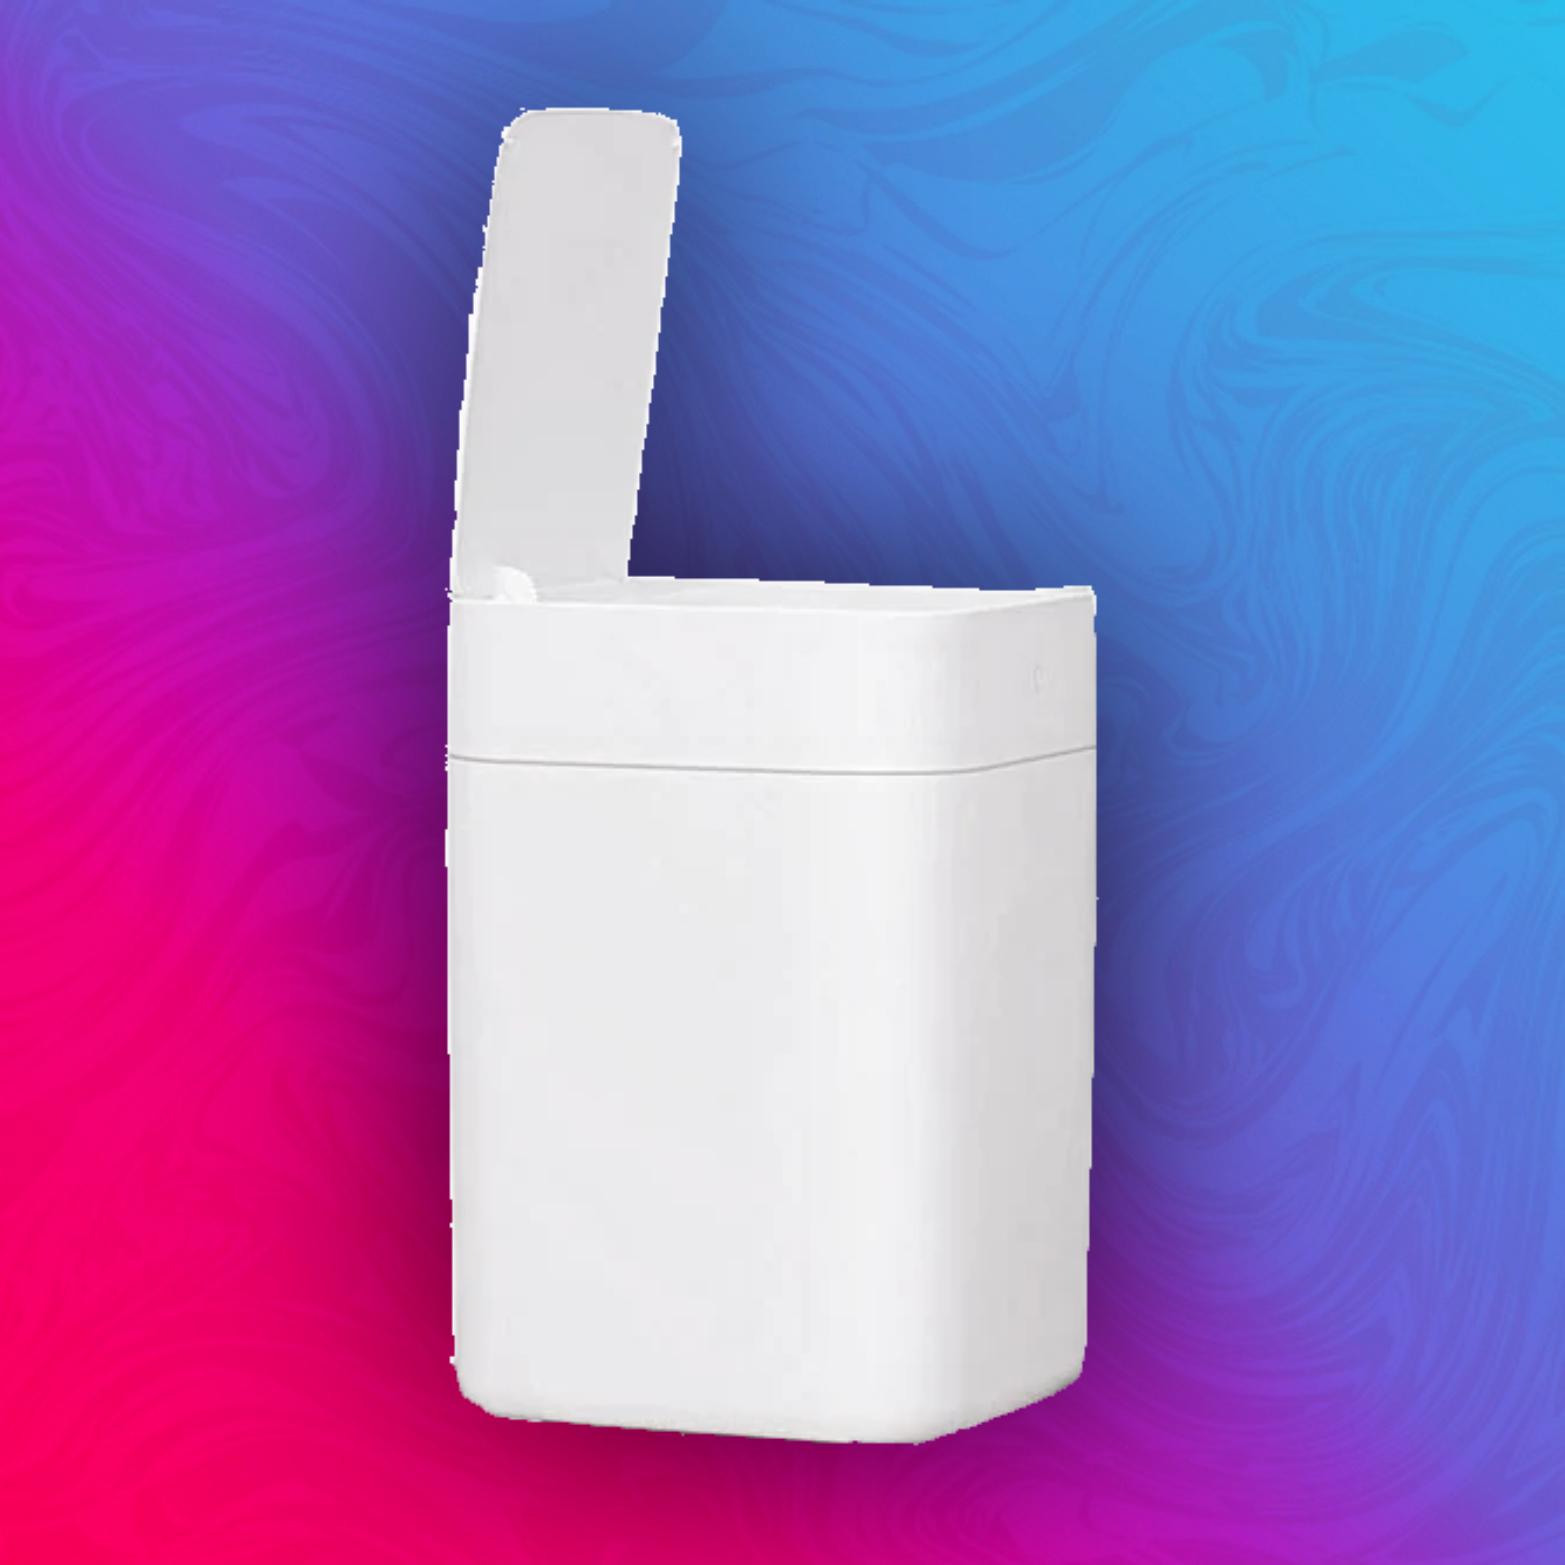 Townew T1: Smarter Mülleimer - Automatisches öffnen - Mülltüten zuschweißen - 15.5L Volumen - Xiaomi YouPin | Versand aus DE